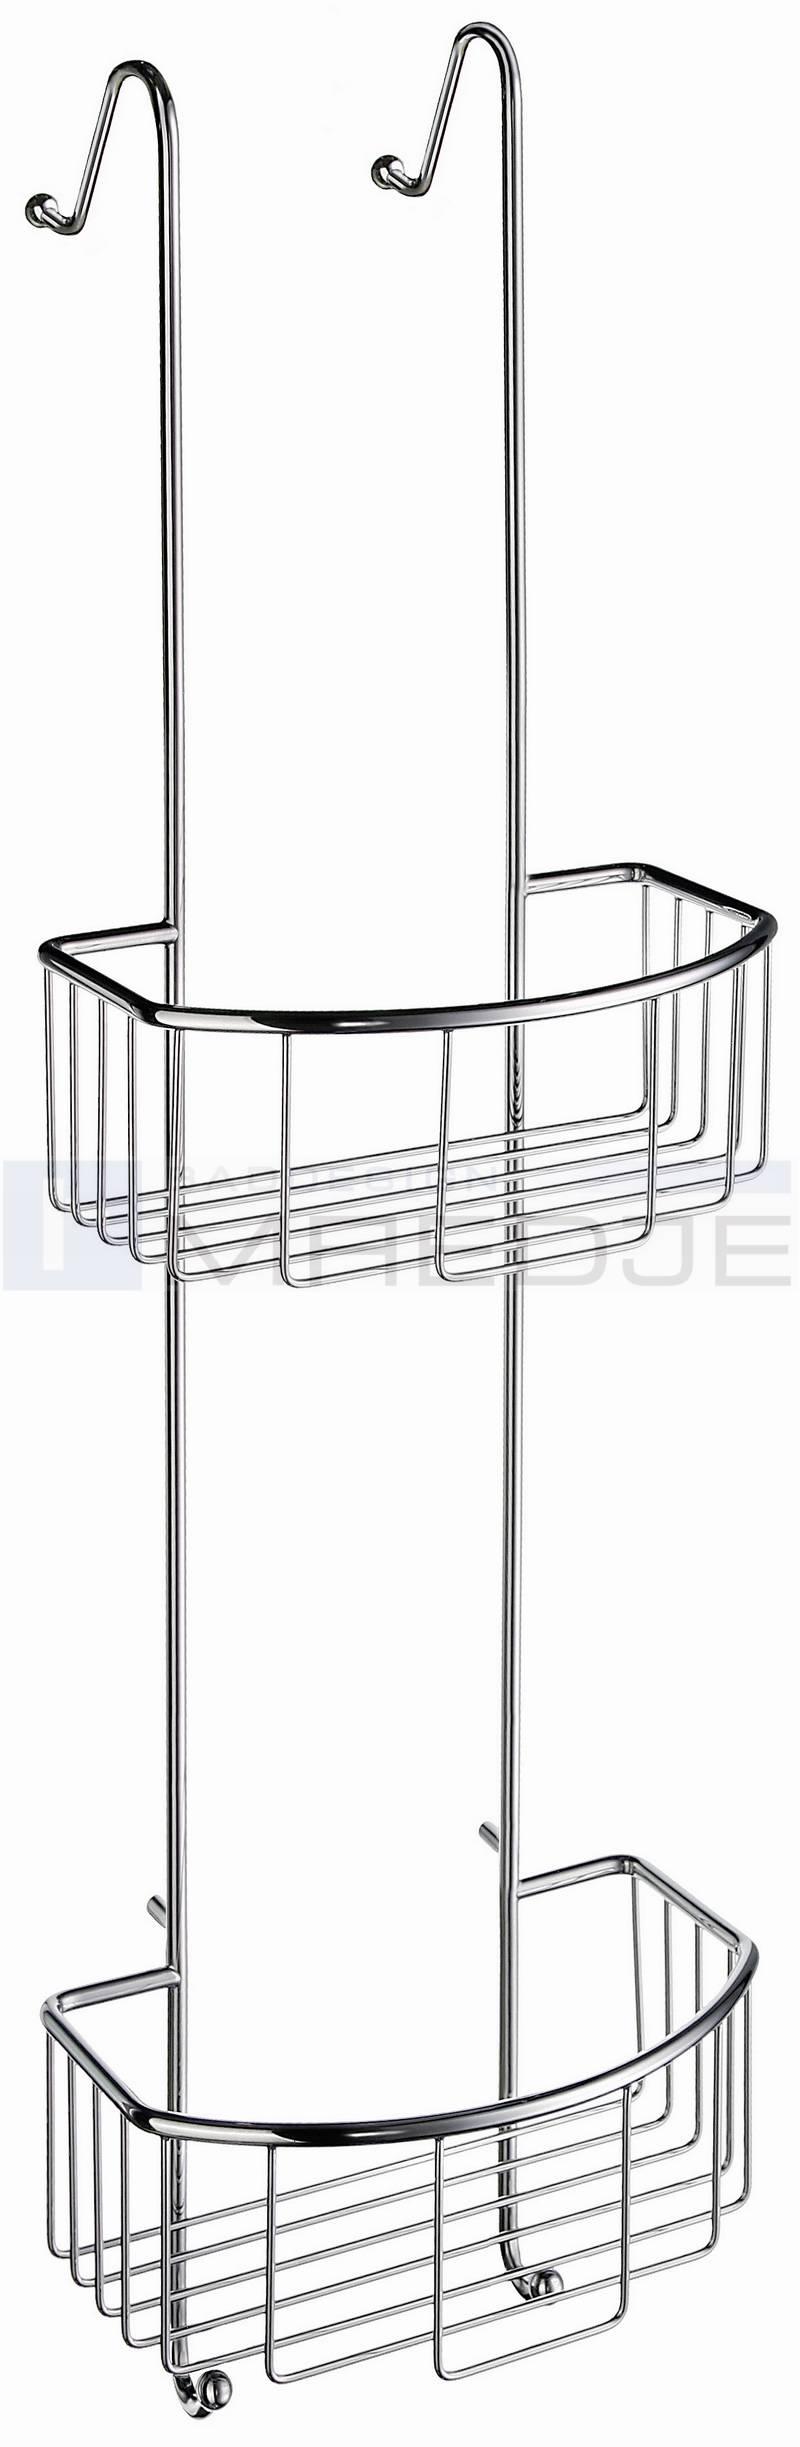 design duschkorb regal korb f r duschabtrennung dusche ebay. Black Bedroom Furniture Sets. Home Design Ideas